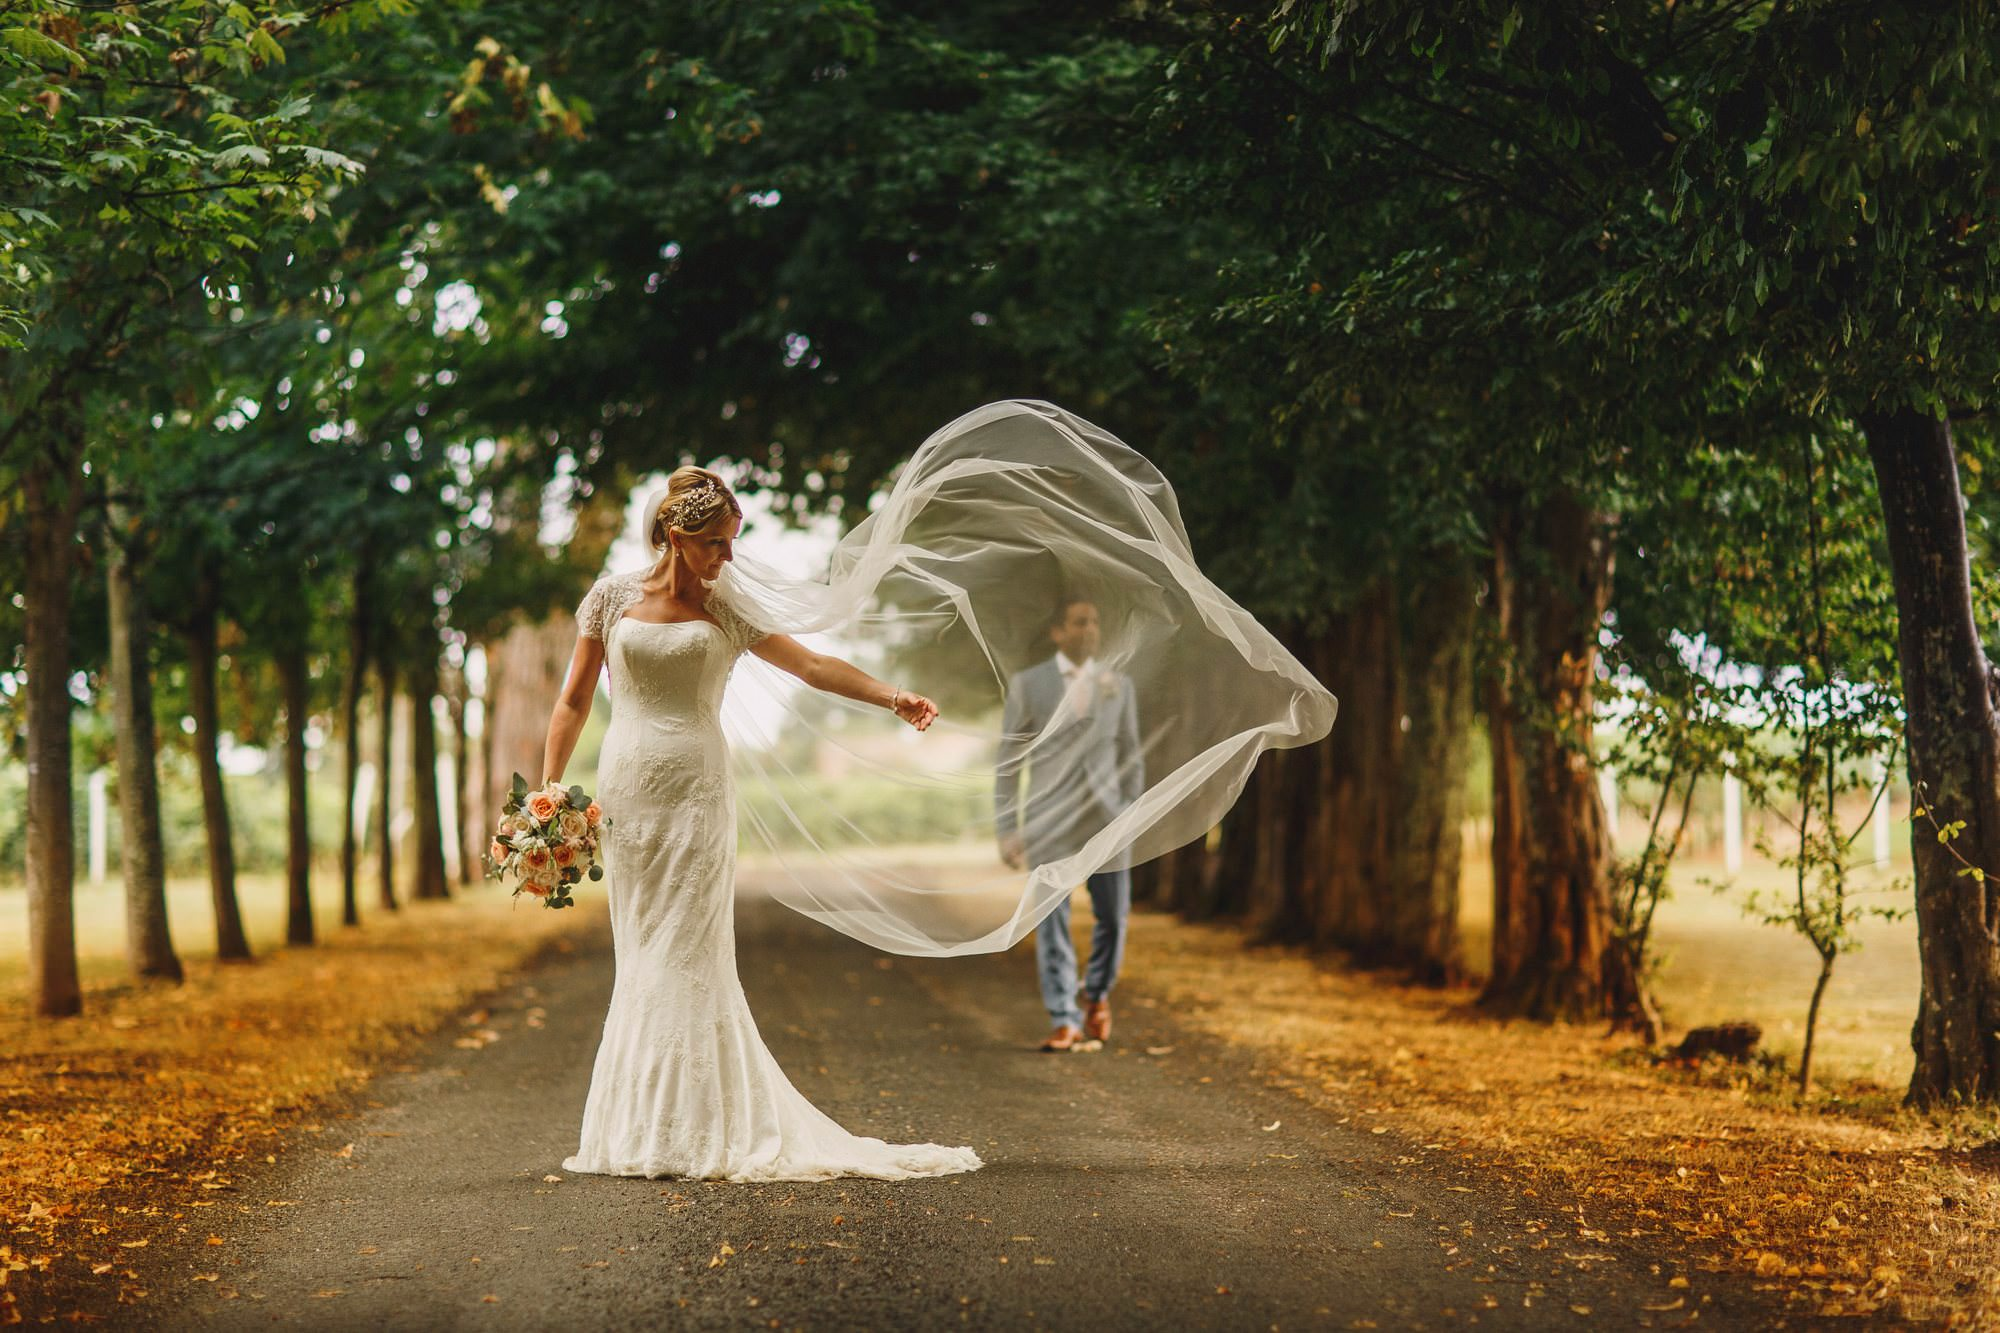 Wedding Photographers in London Paul Johnson Photography Award winning wedding photographers uk